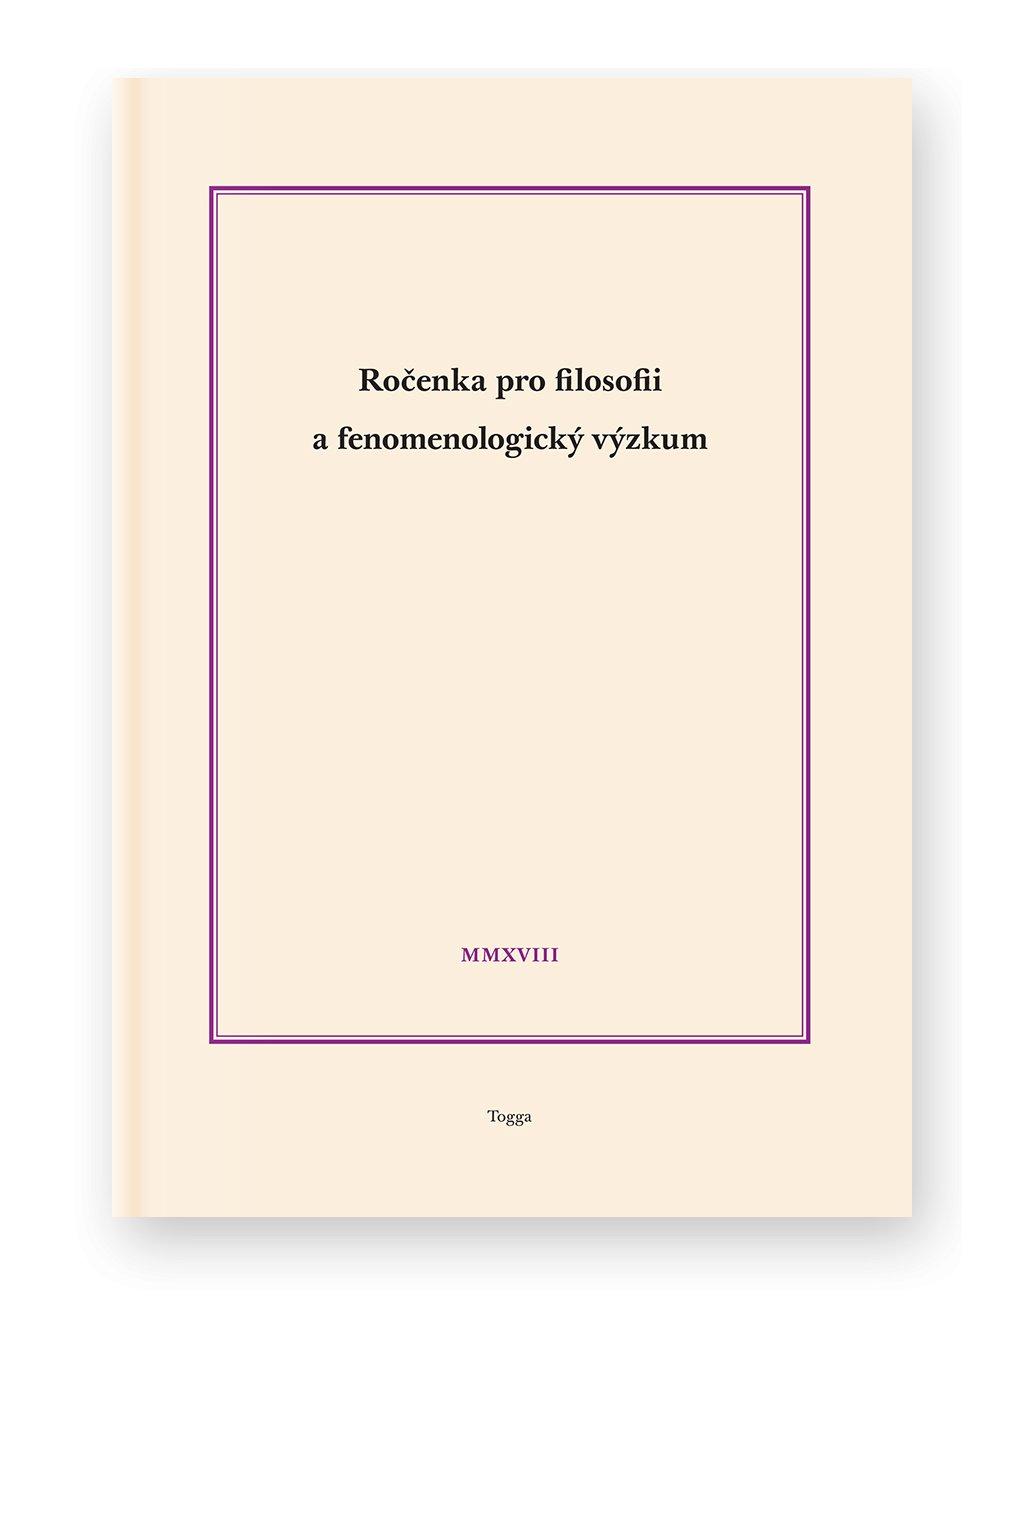 1254 rocenka pro filosofii a fenomenologicky vyzkum 2018